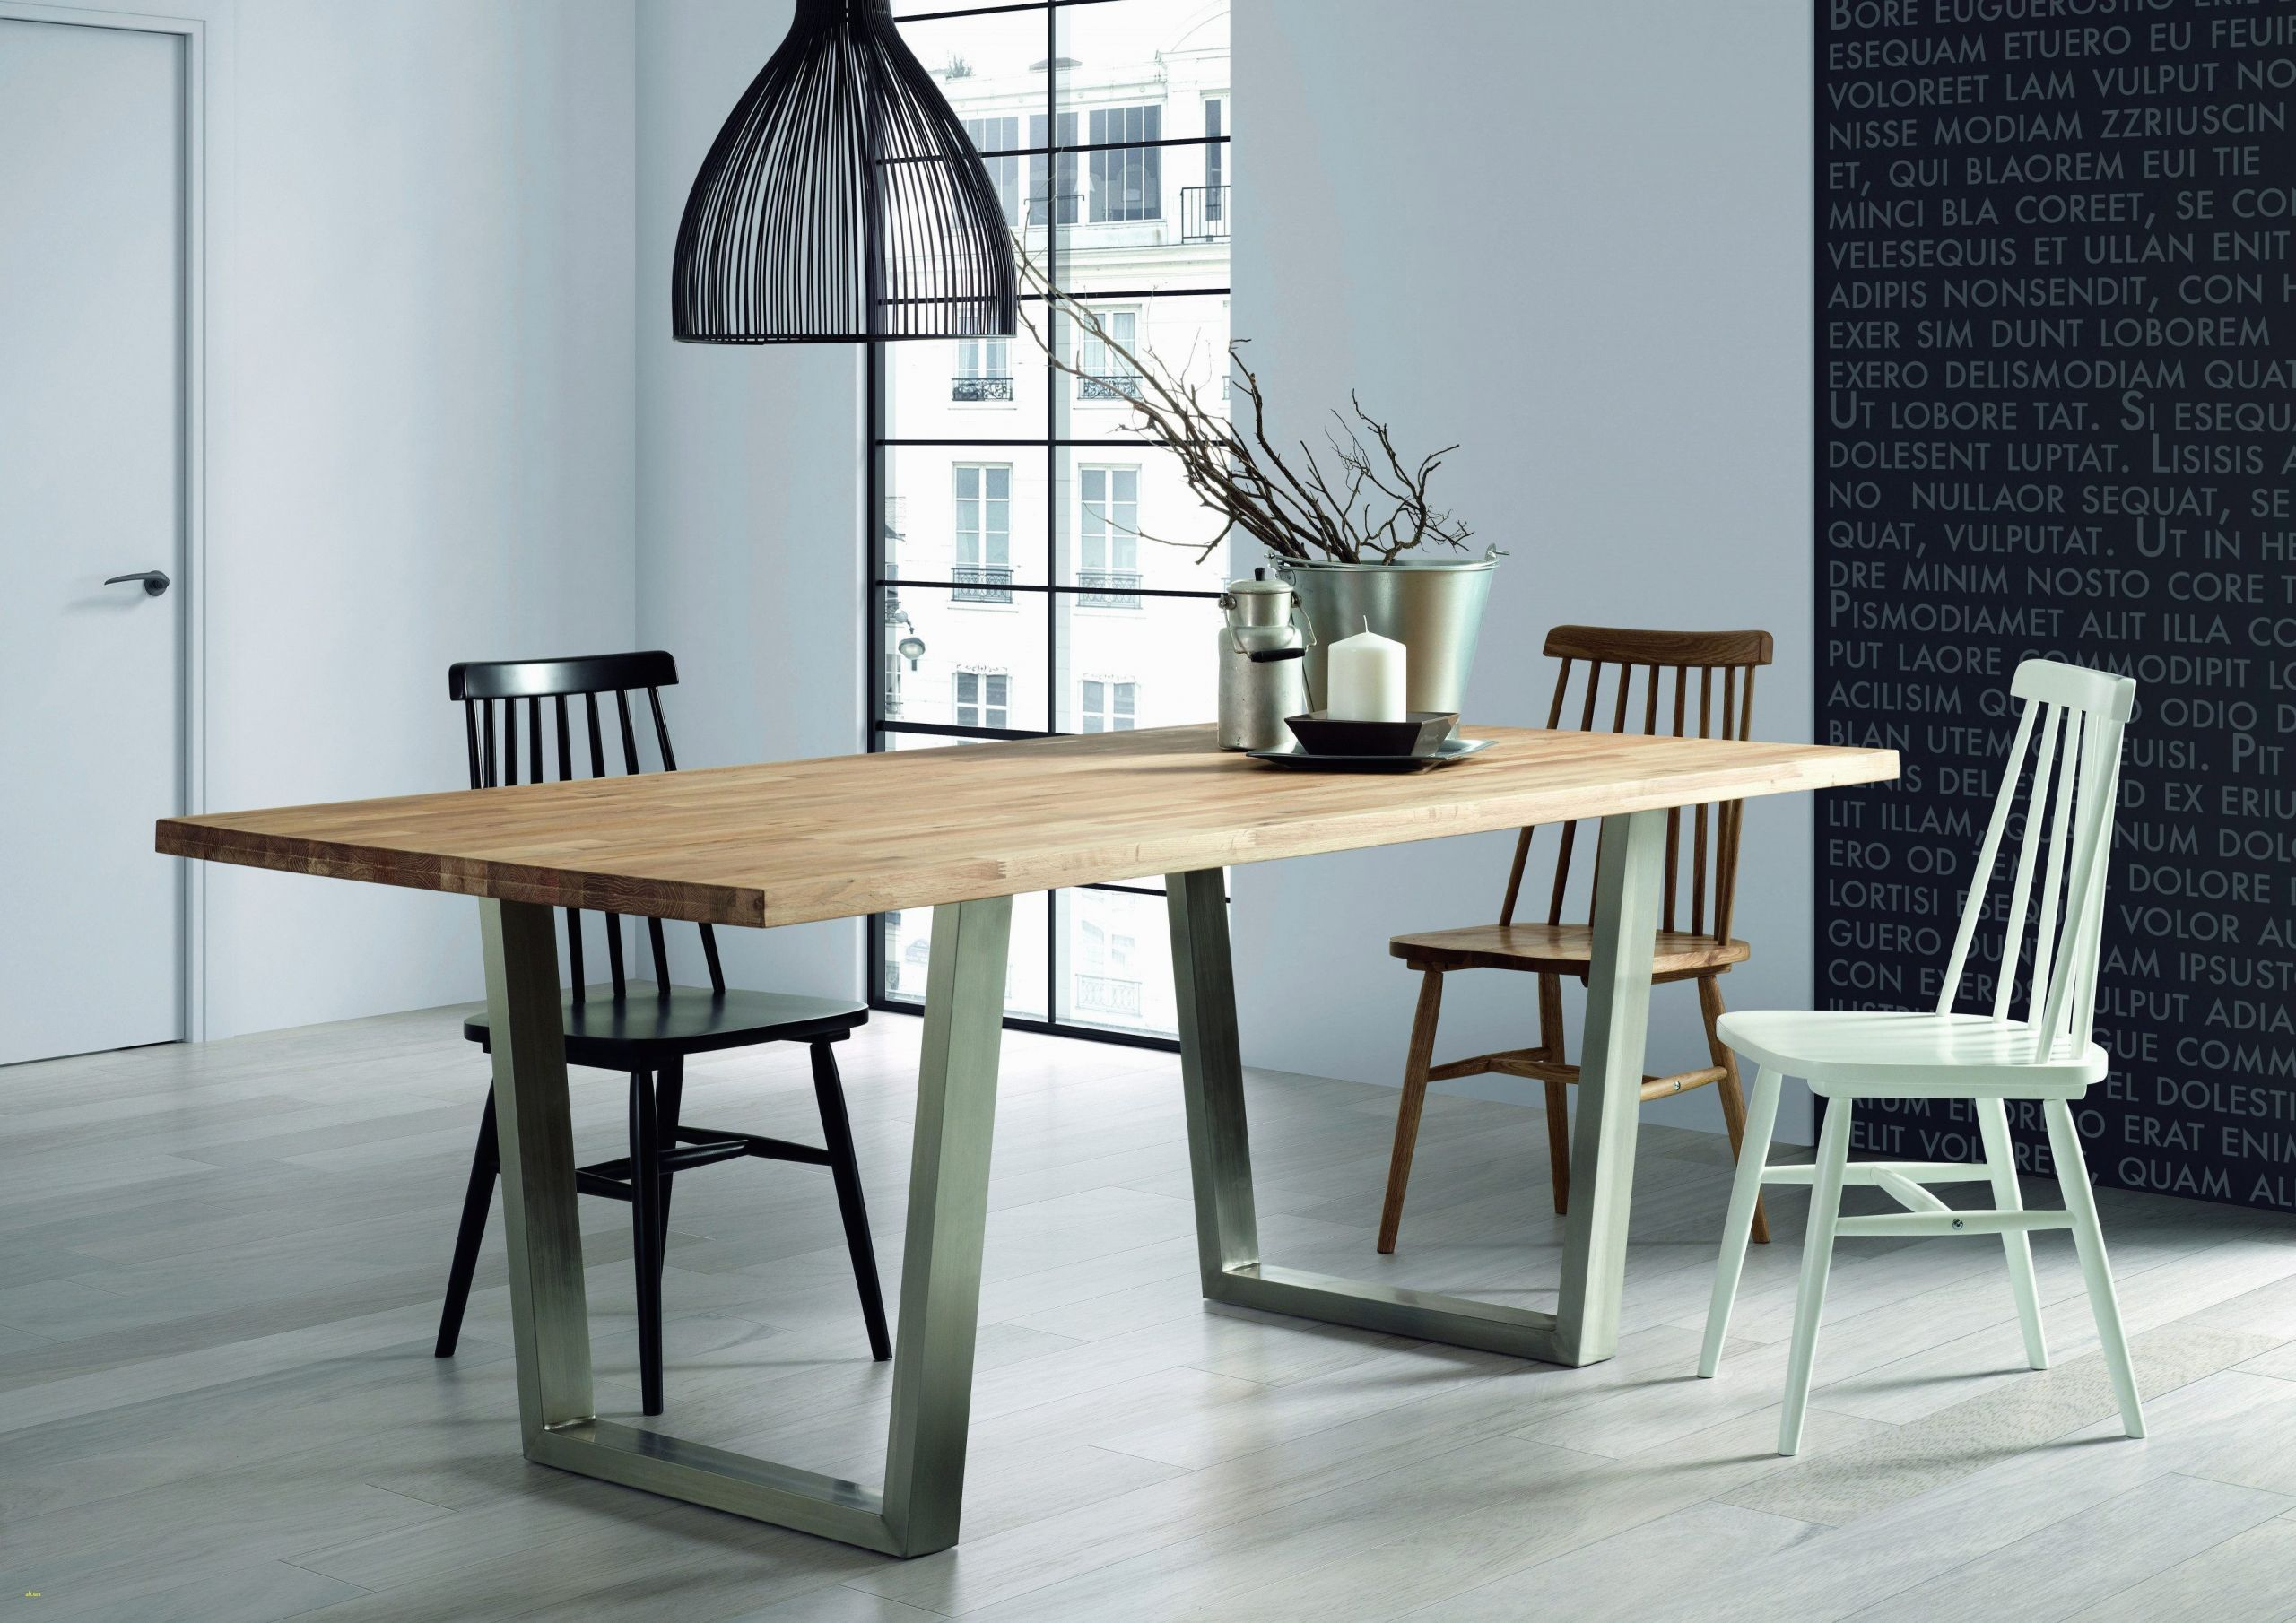 40 Inspirant Table Exterieur Carrefour | Salon Jardin avec Abri De Jardin Metal Carrefour